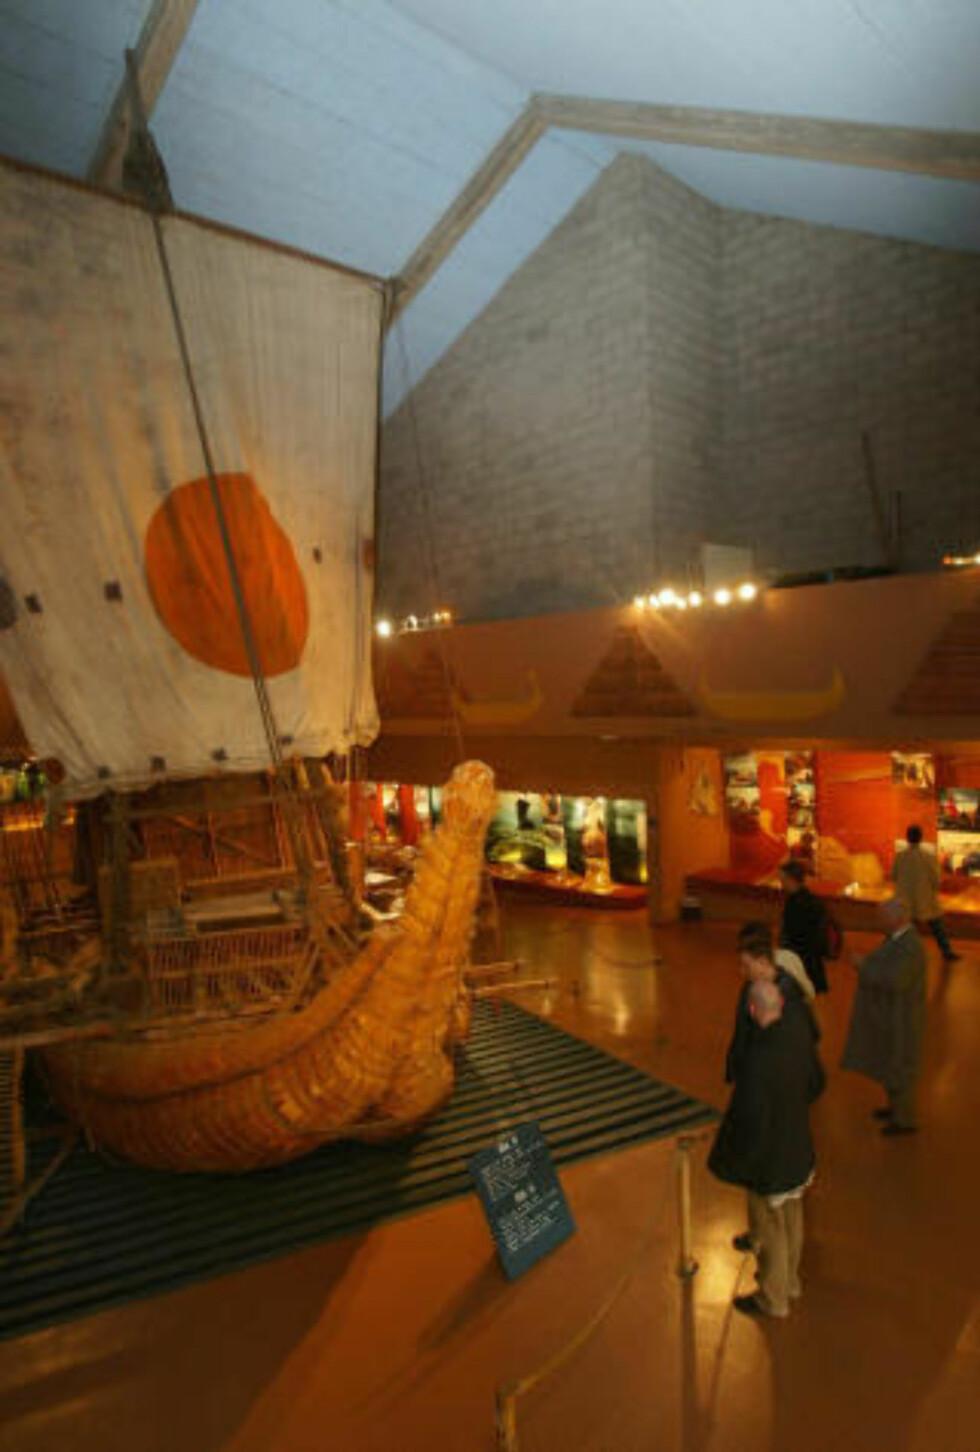 NASJONALE KLENODIER: På Kon-Tiki-museet oppbevares blant annet sivbåten Ra to. Foto: Foto: Morten Holm / SCANPIX